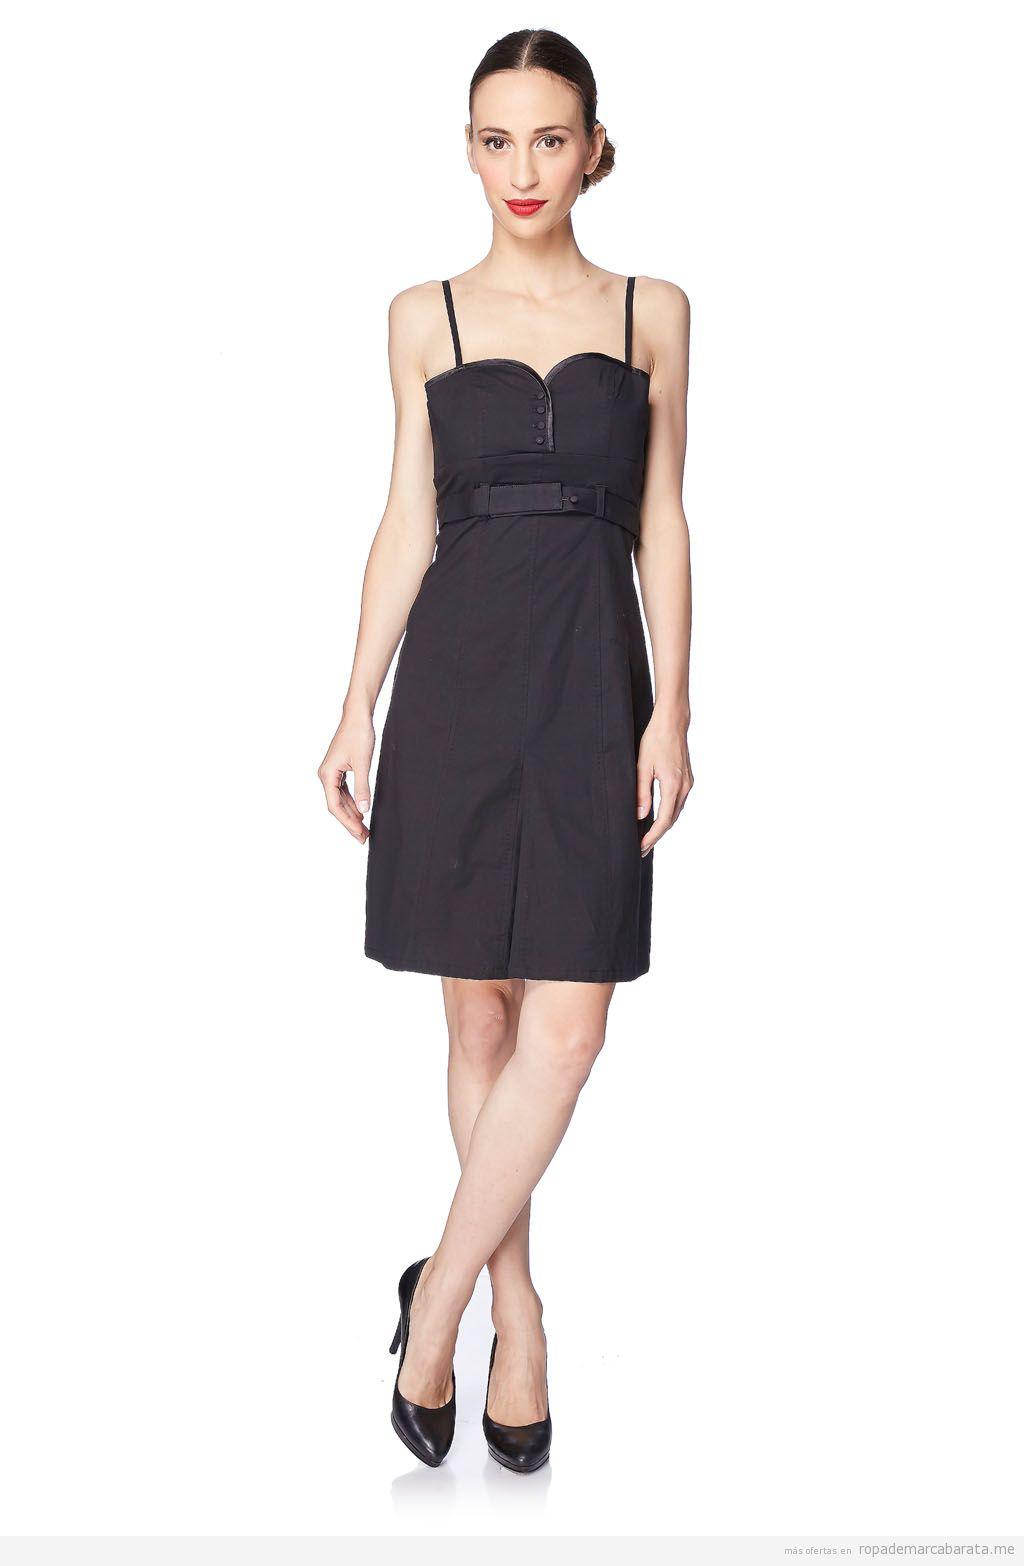 Vestidos elegantes marca Diego Reiga, outlet online 2